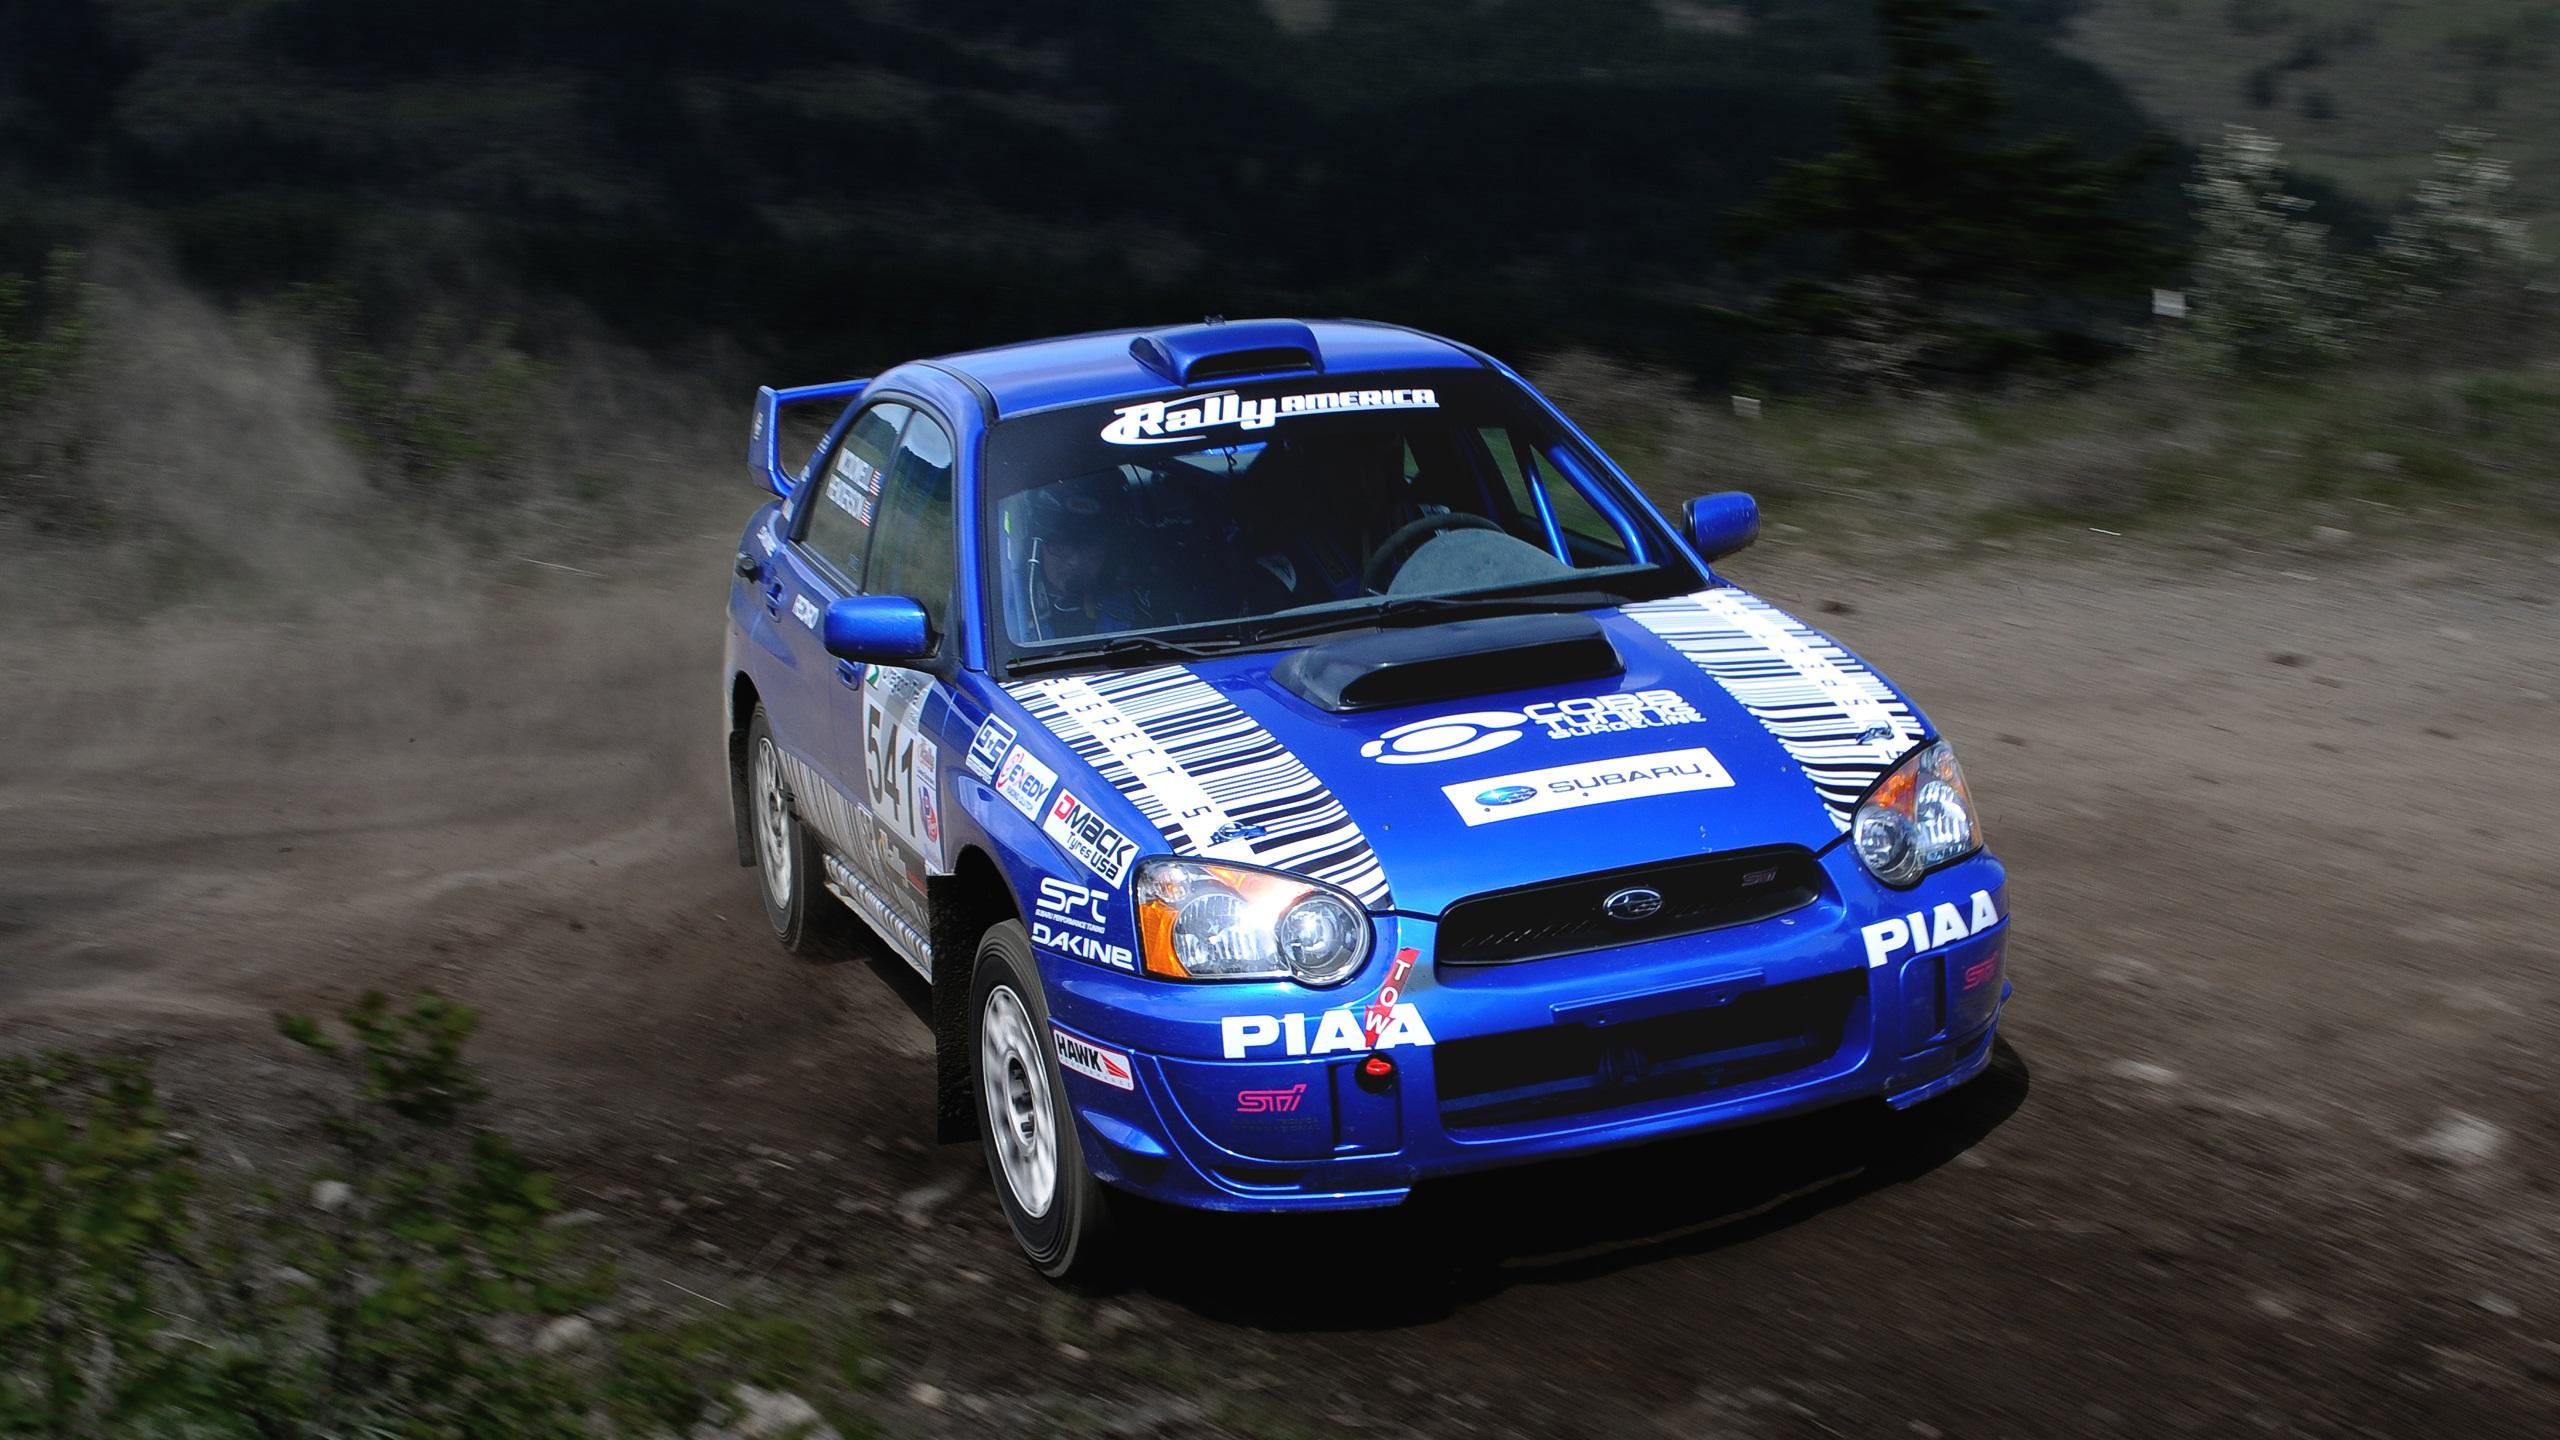 Subaru Impreza Blue Rally Sport Car 750x1334 Iphone 8766s